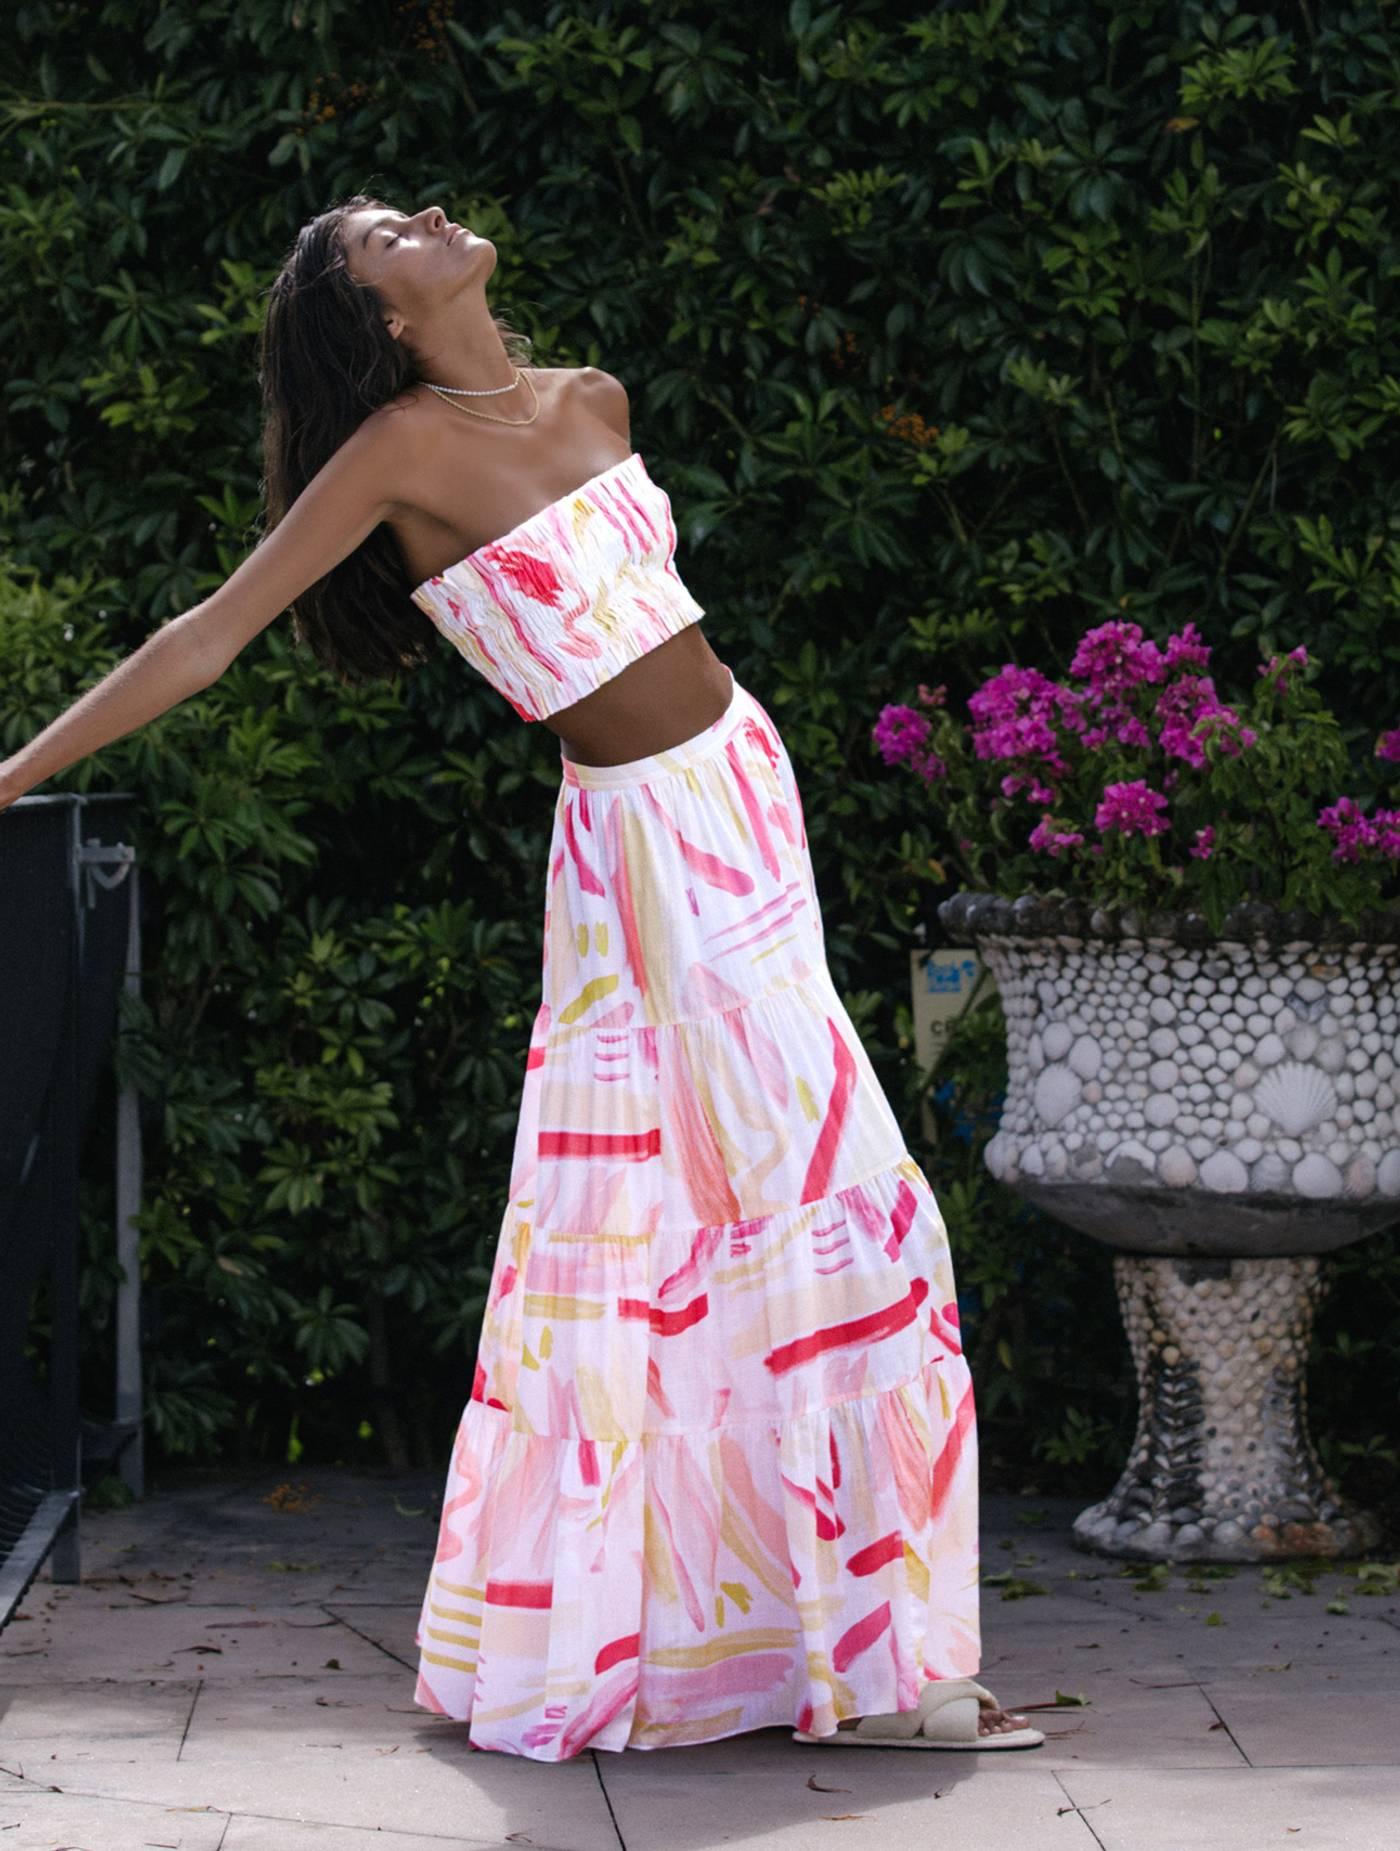 Parasol Skirt